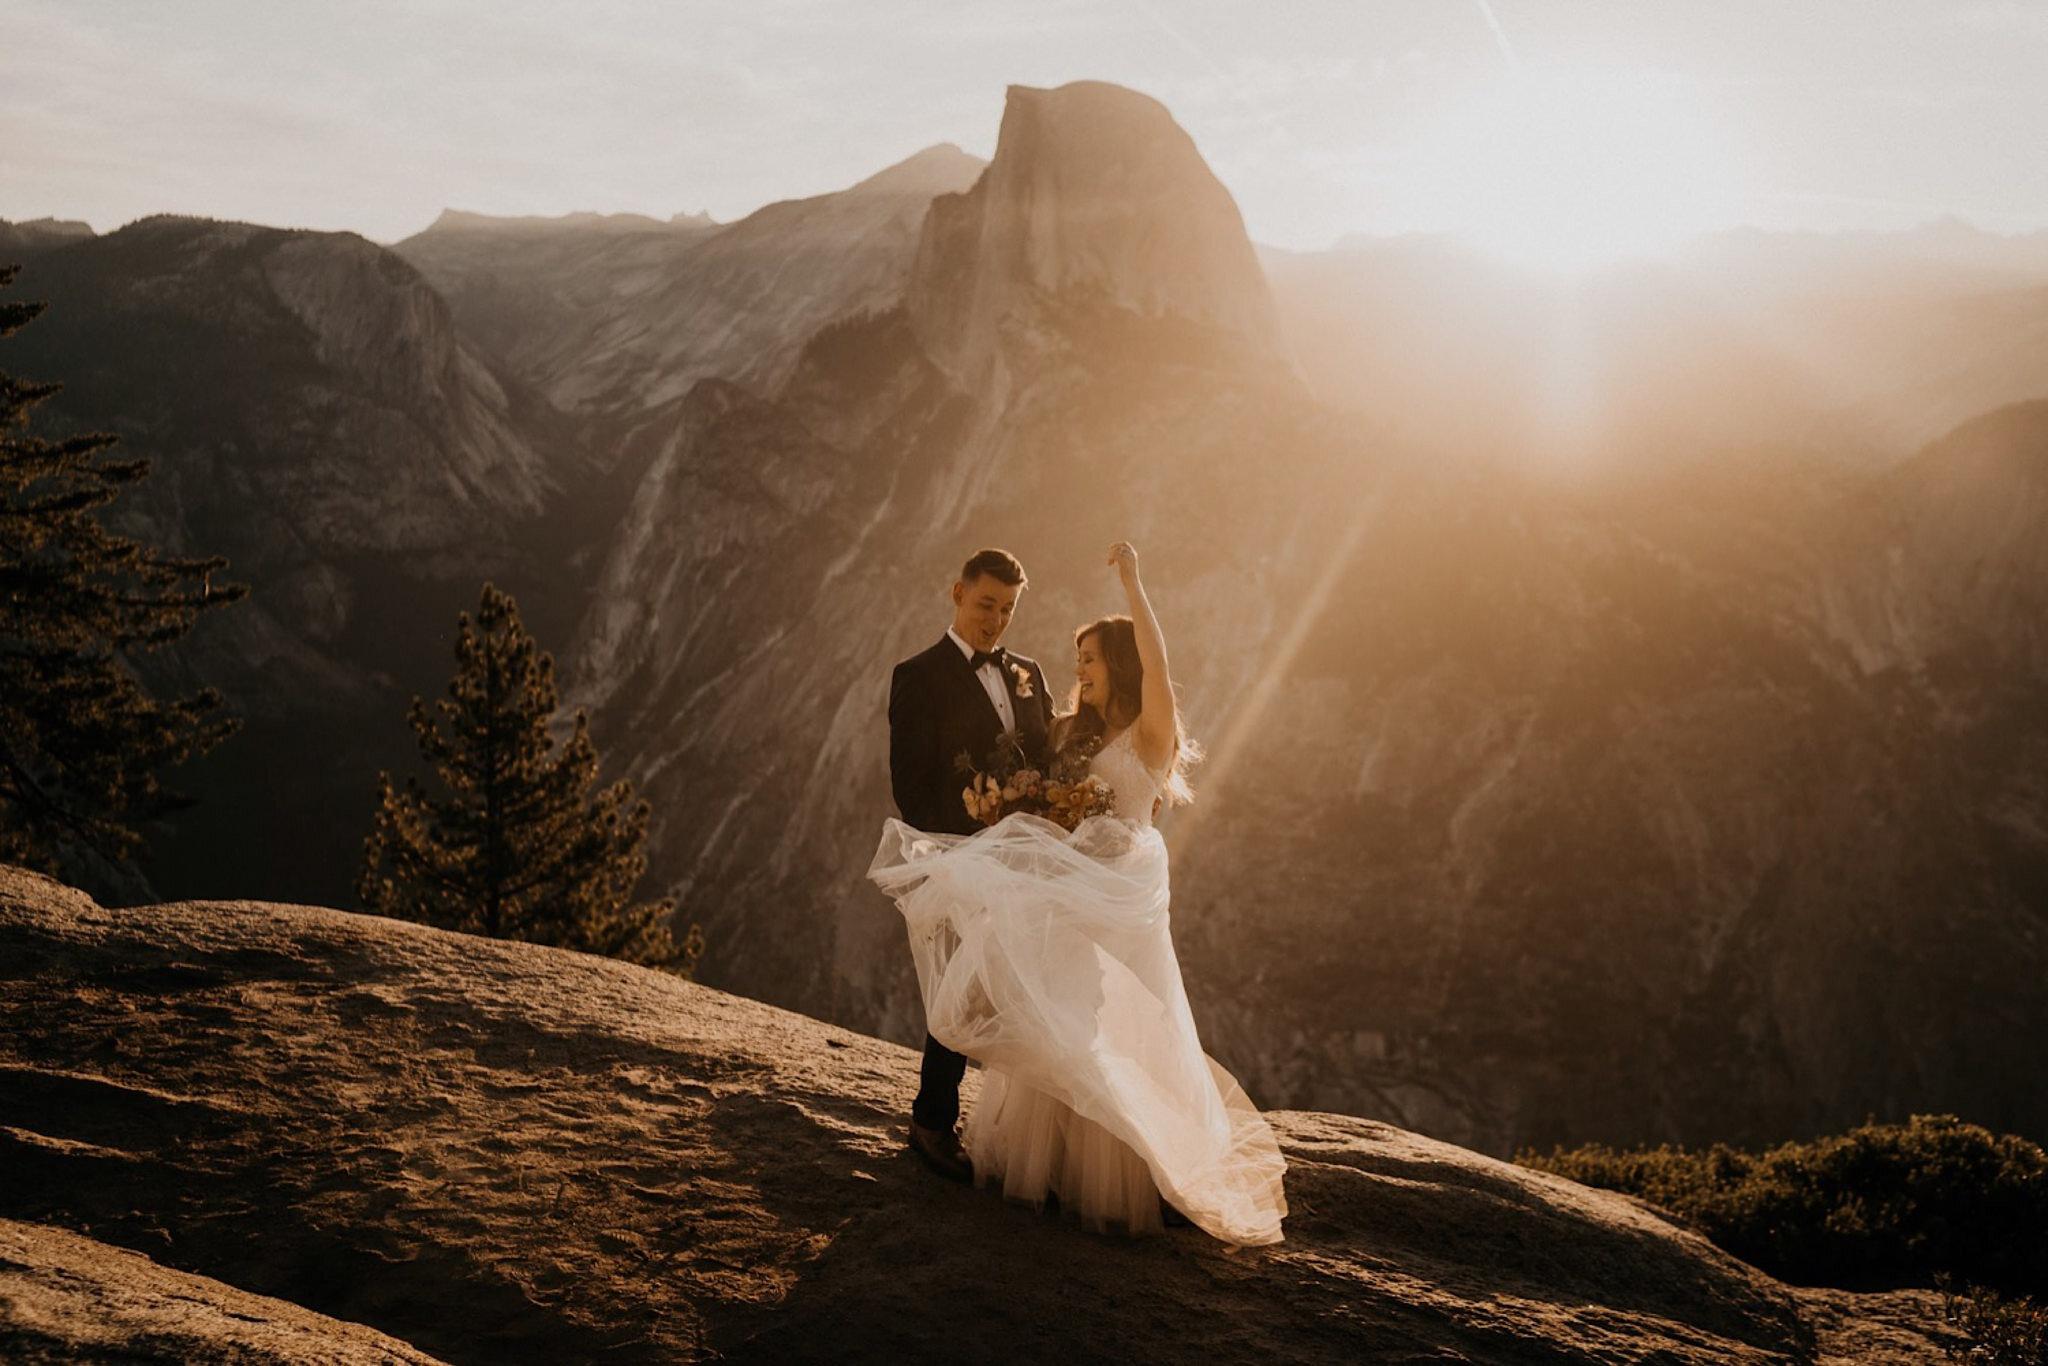 Yosemite-Adventure-Elopement-Taft-Glacier-Point-31.jpg